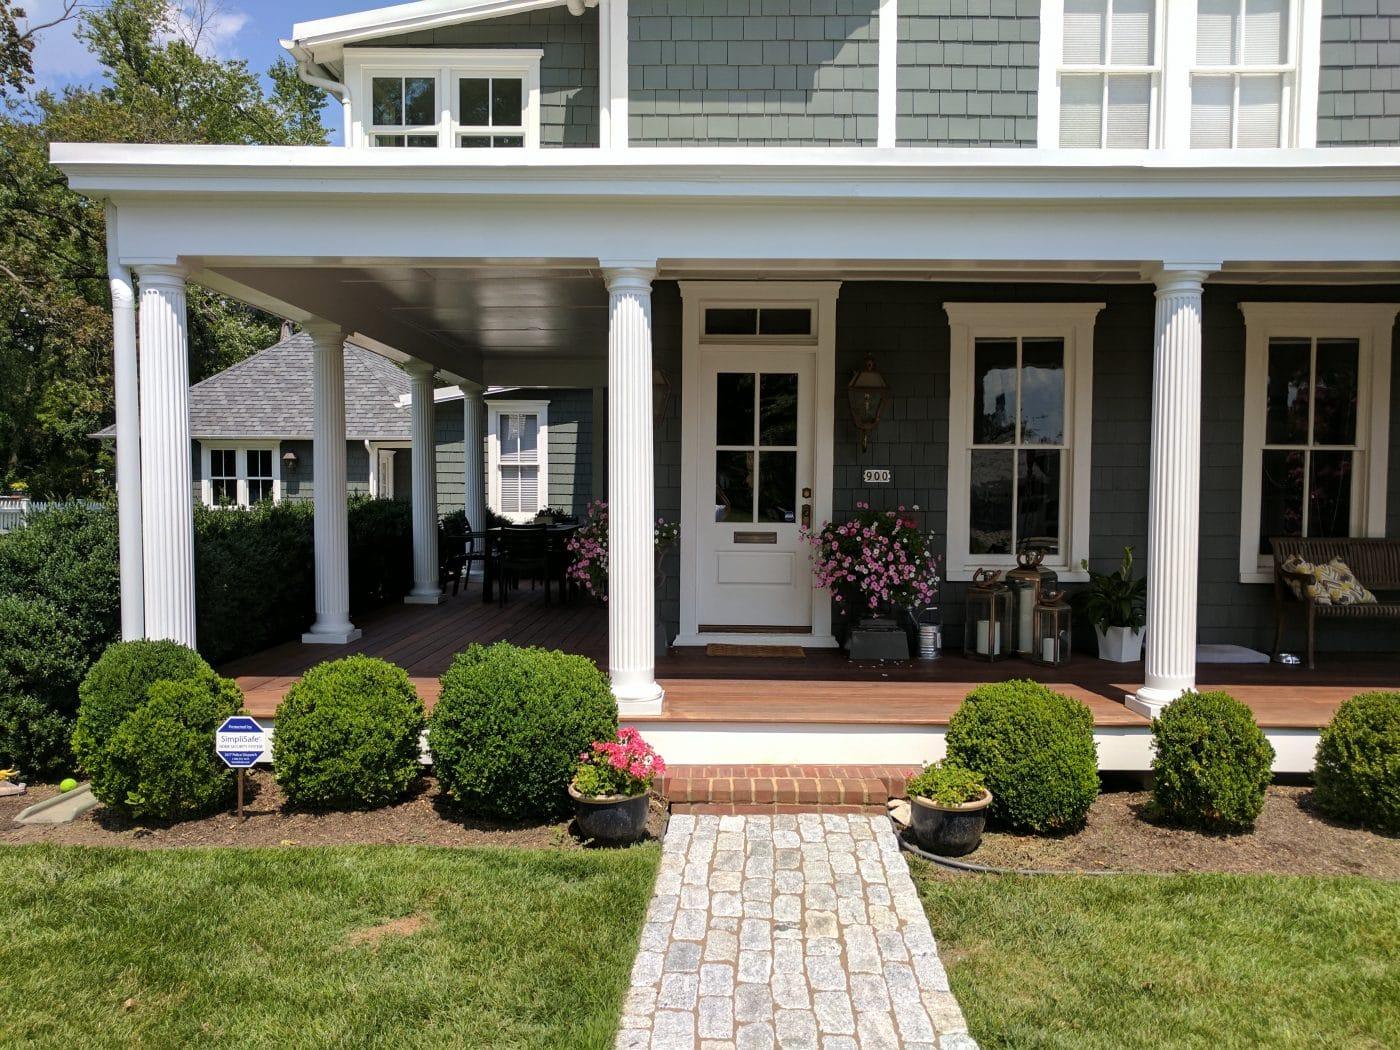 Home Improvement & Repair Services